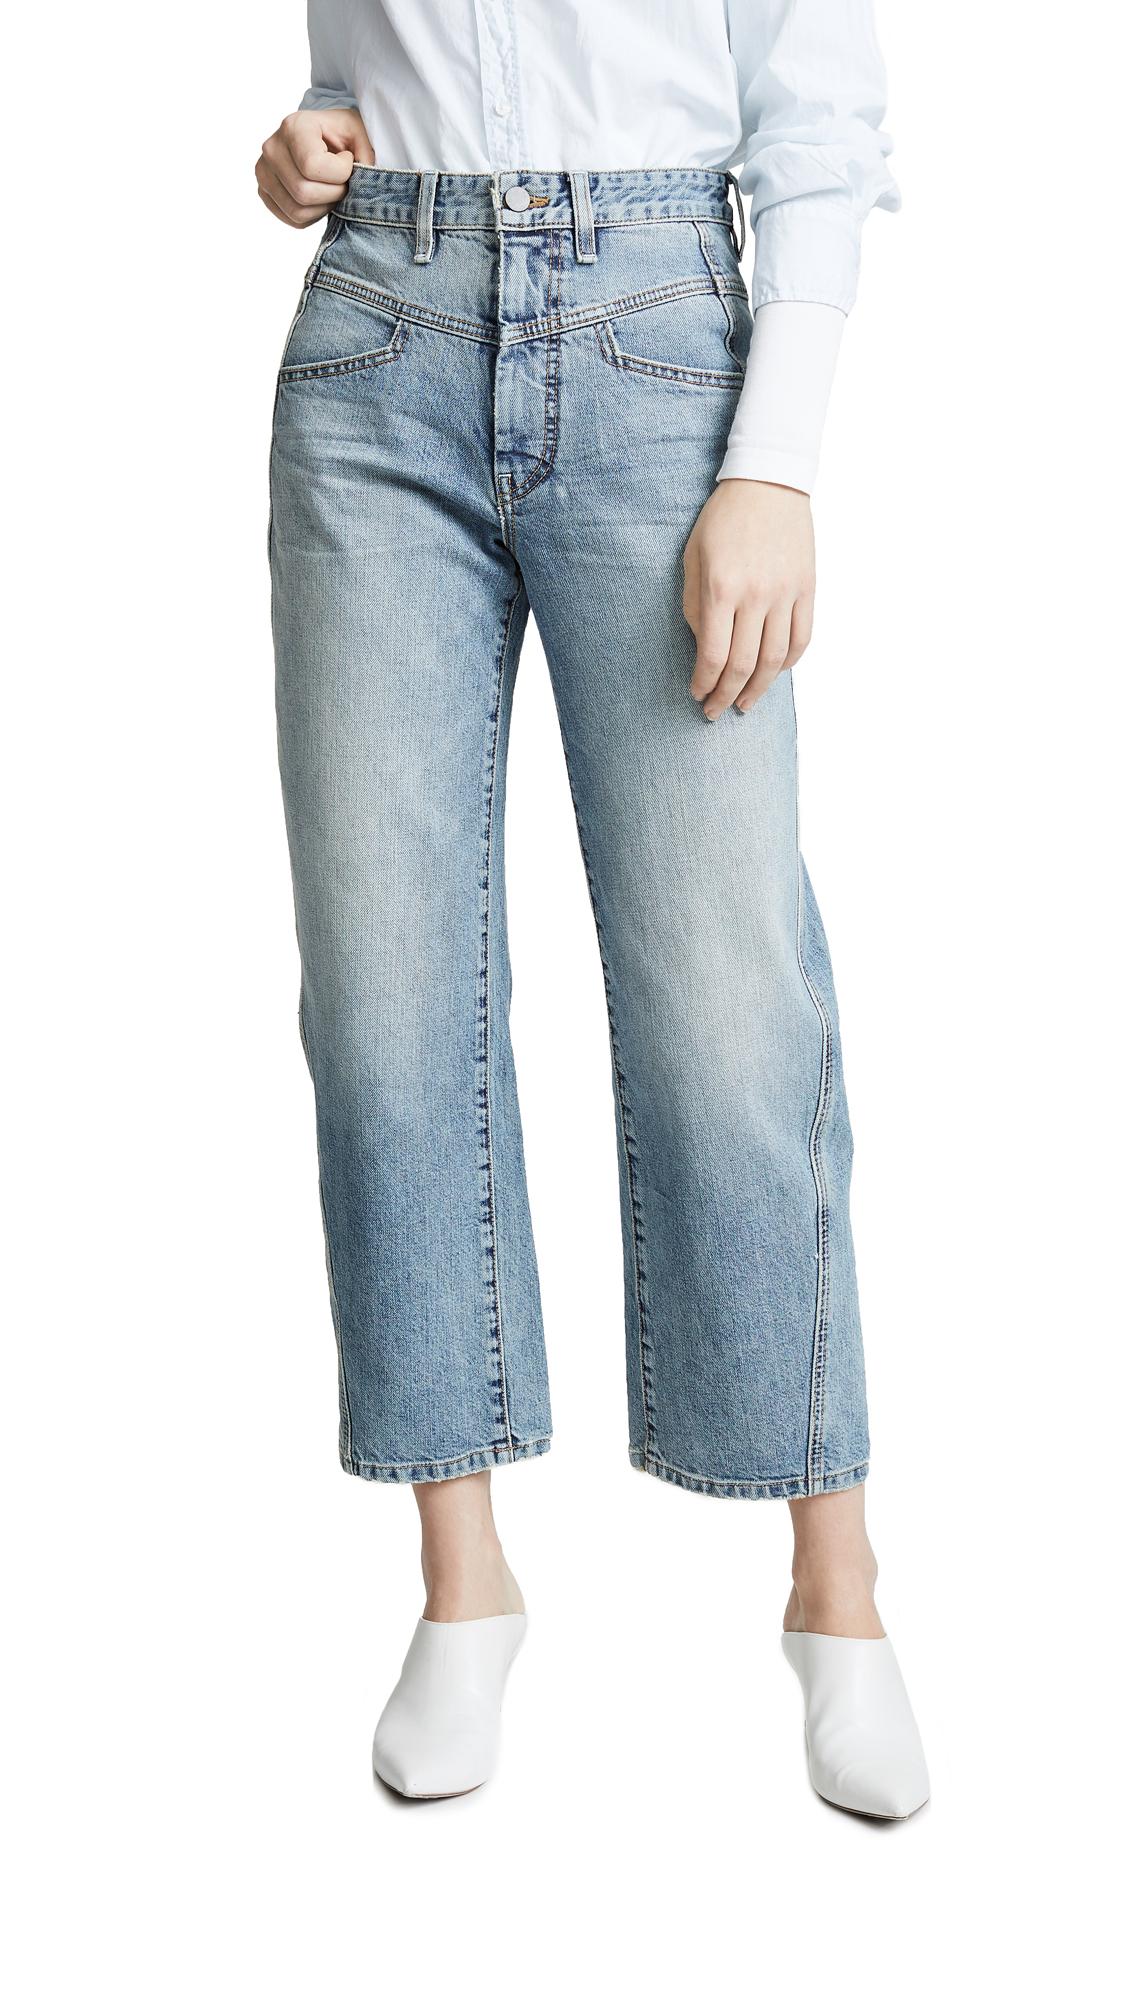 Colovos Vintage Front Yoke Jeans